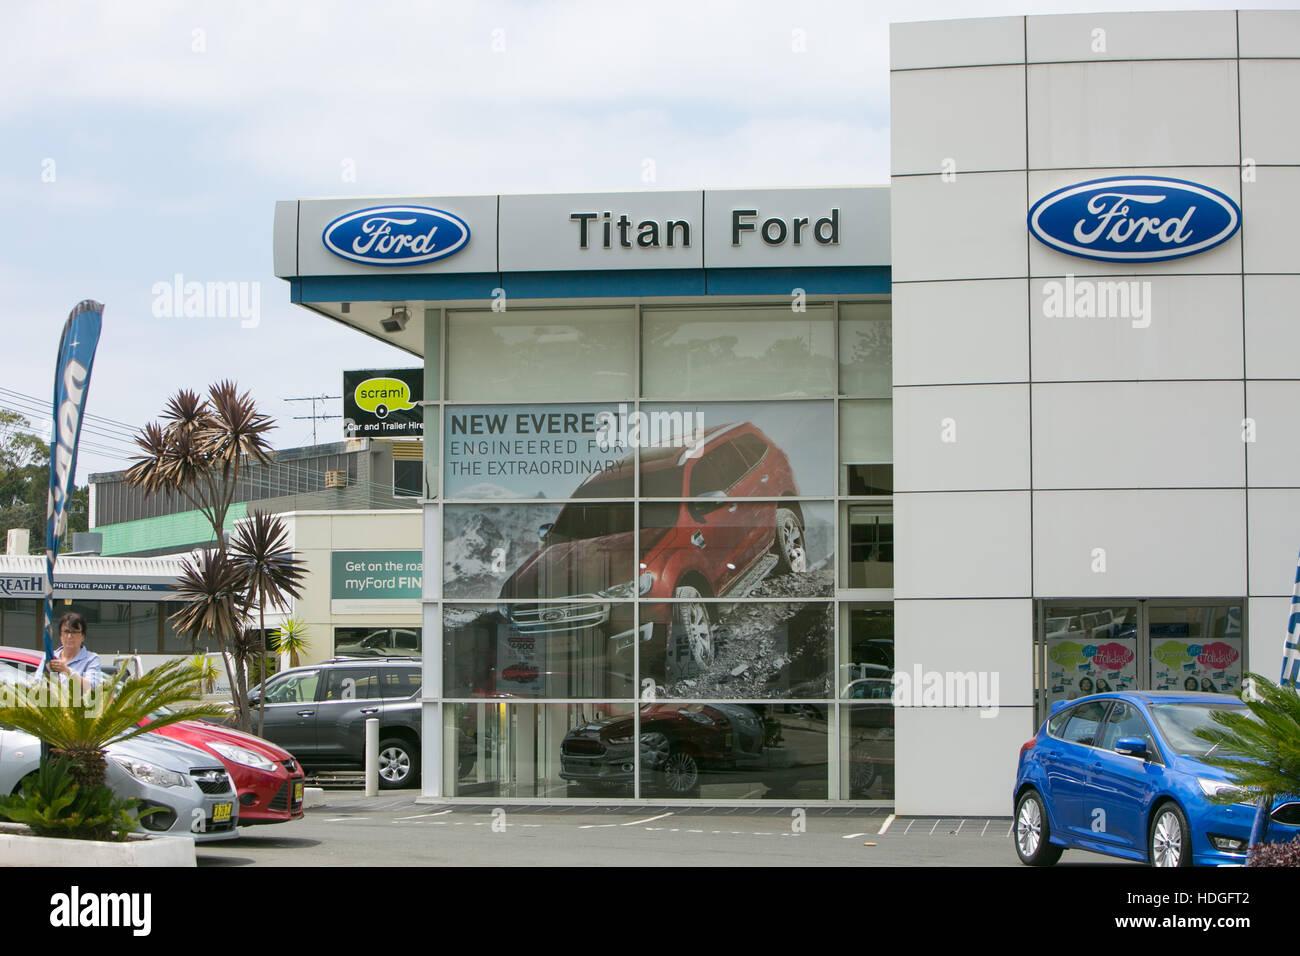 Ford Motor Car Dealership In North Sydney New South Wales Australia